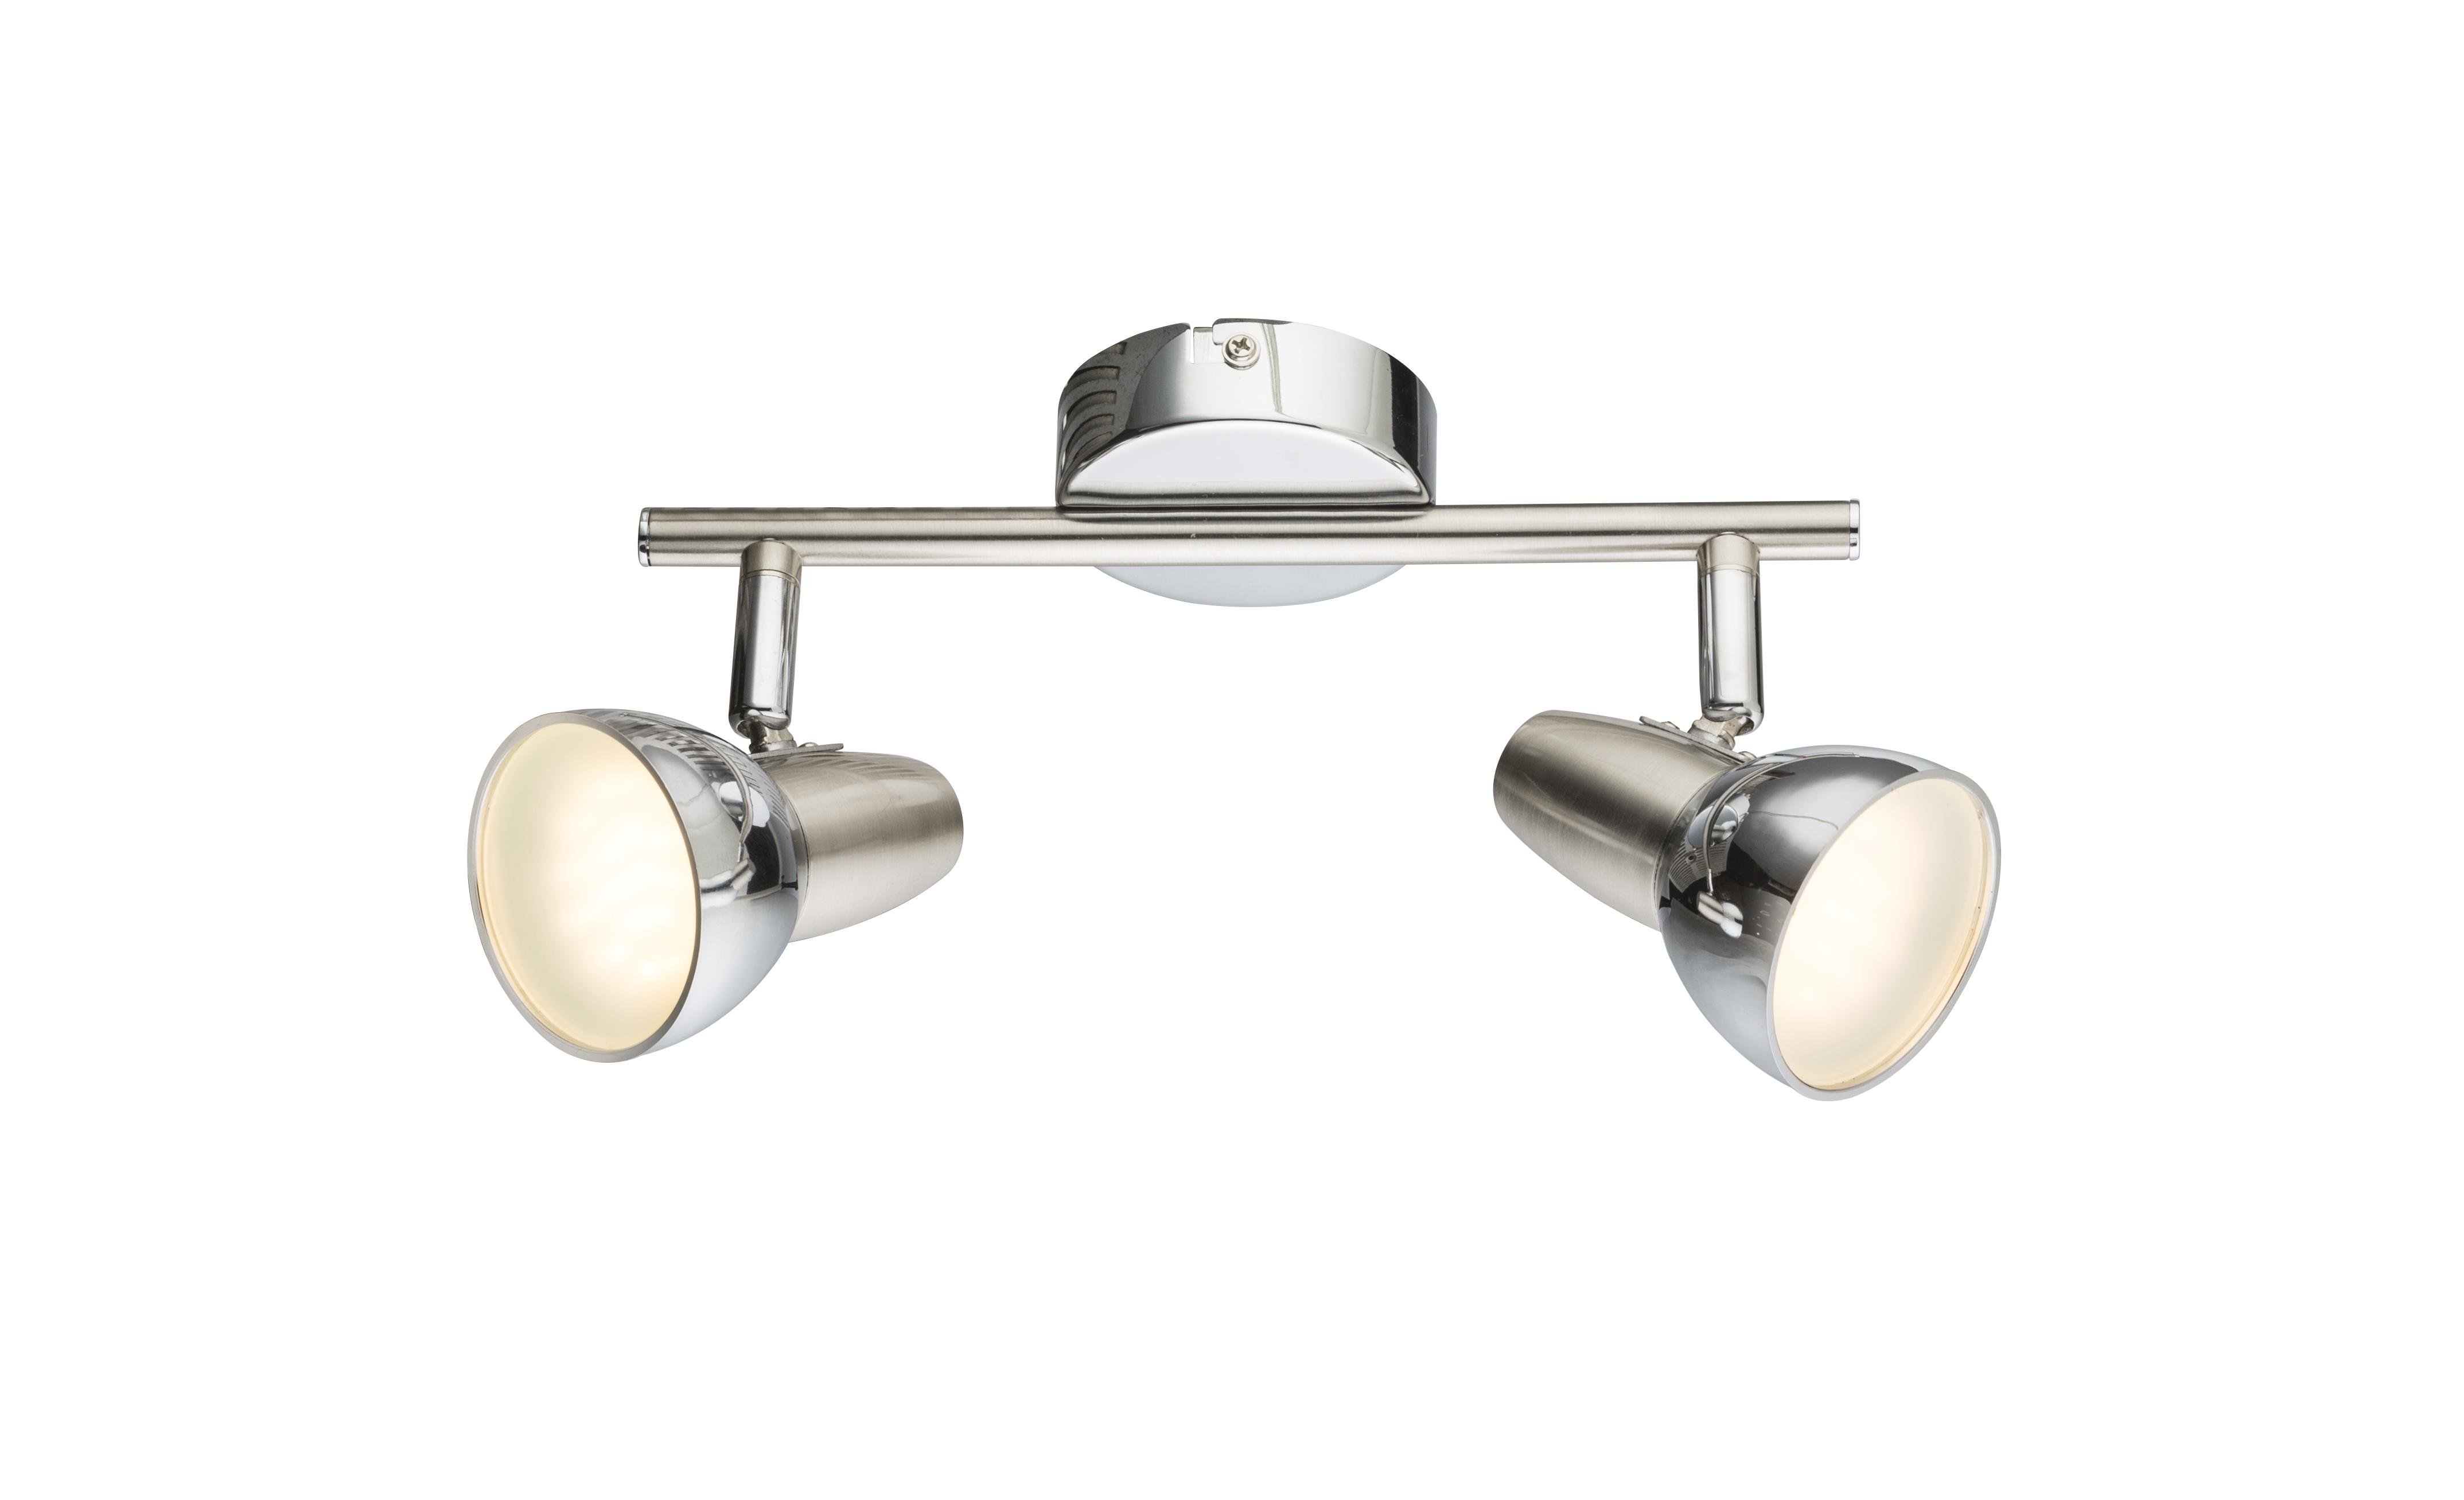 купить Настенно-потолочный светильник Настенно-потолочный светильник Cappuccino по цене 3490 рублей